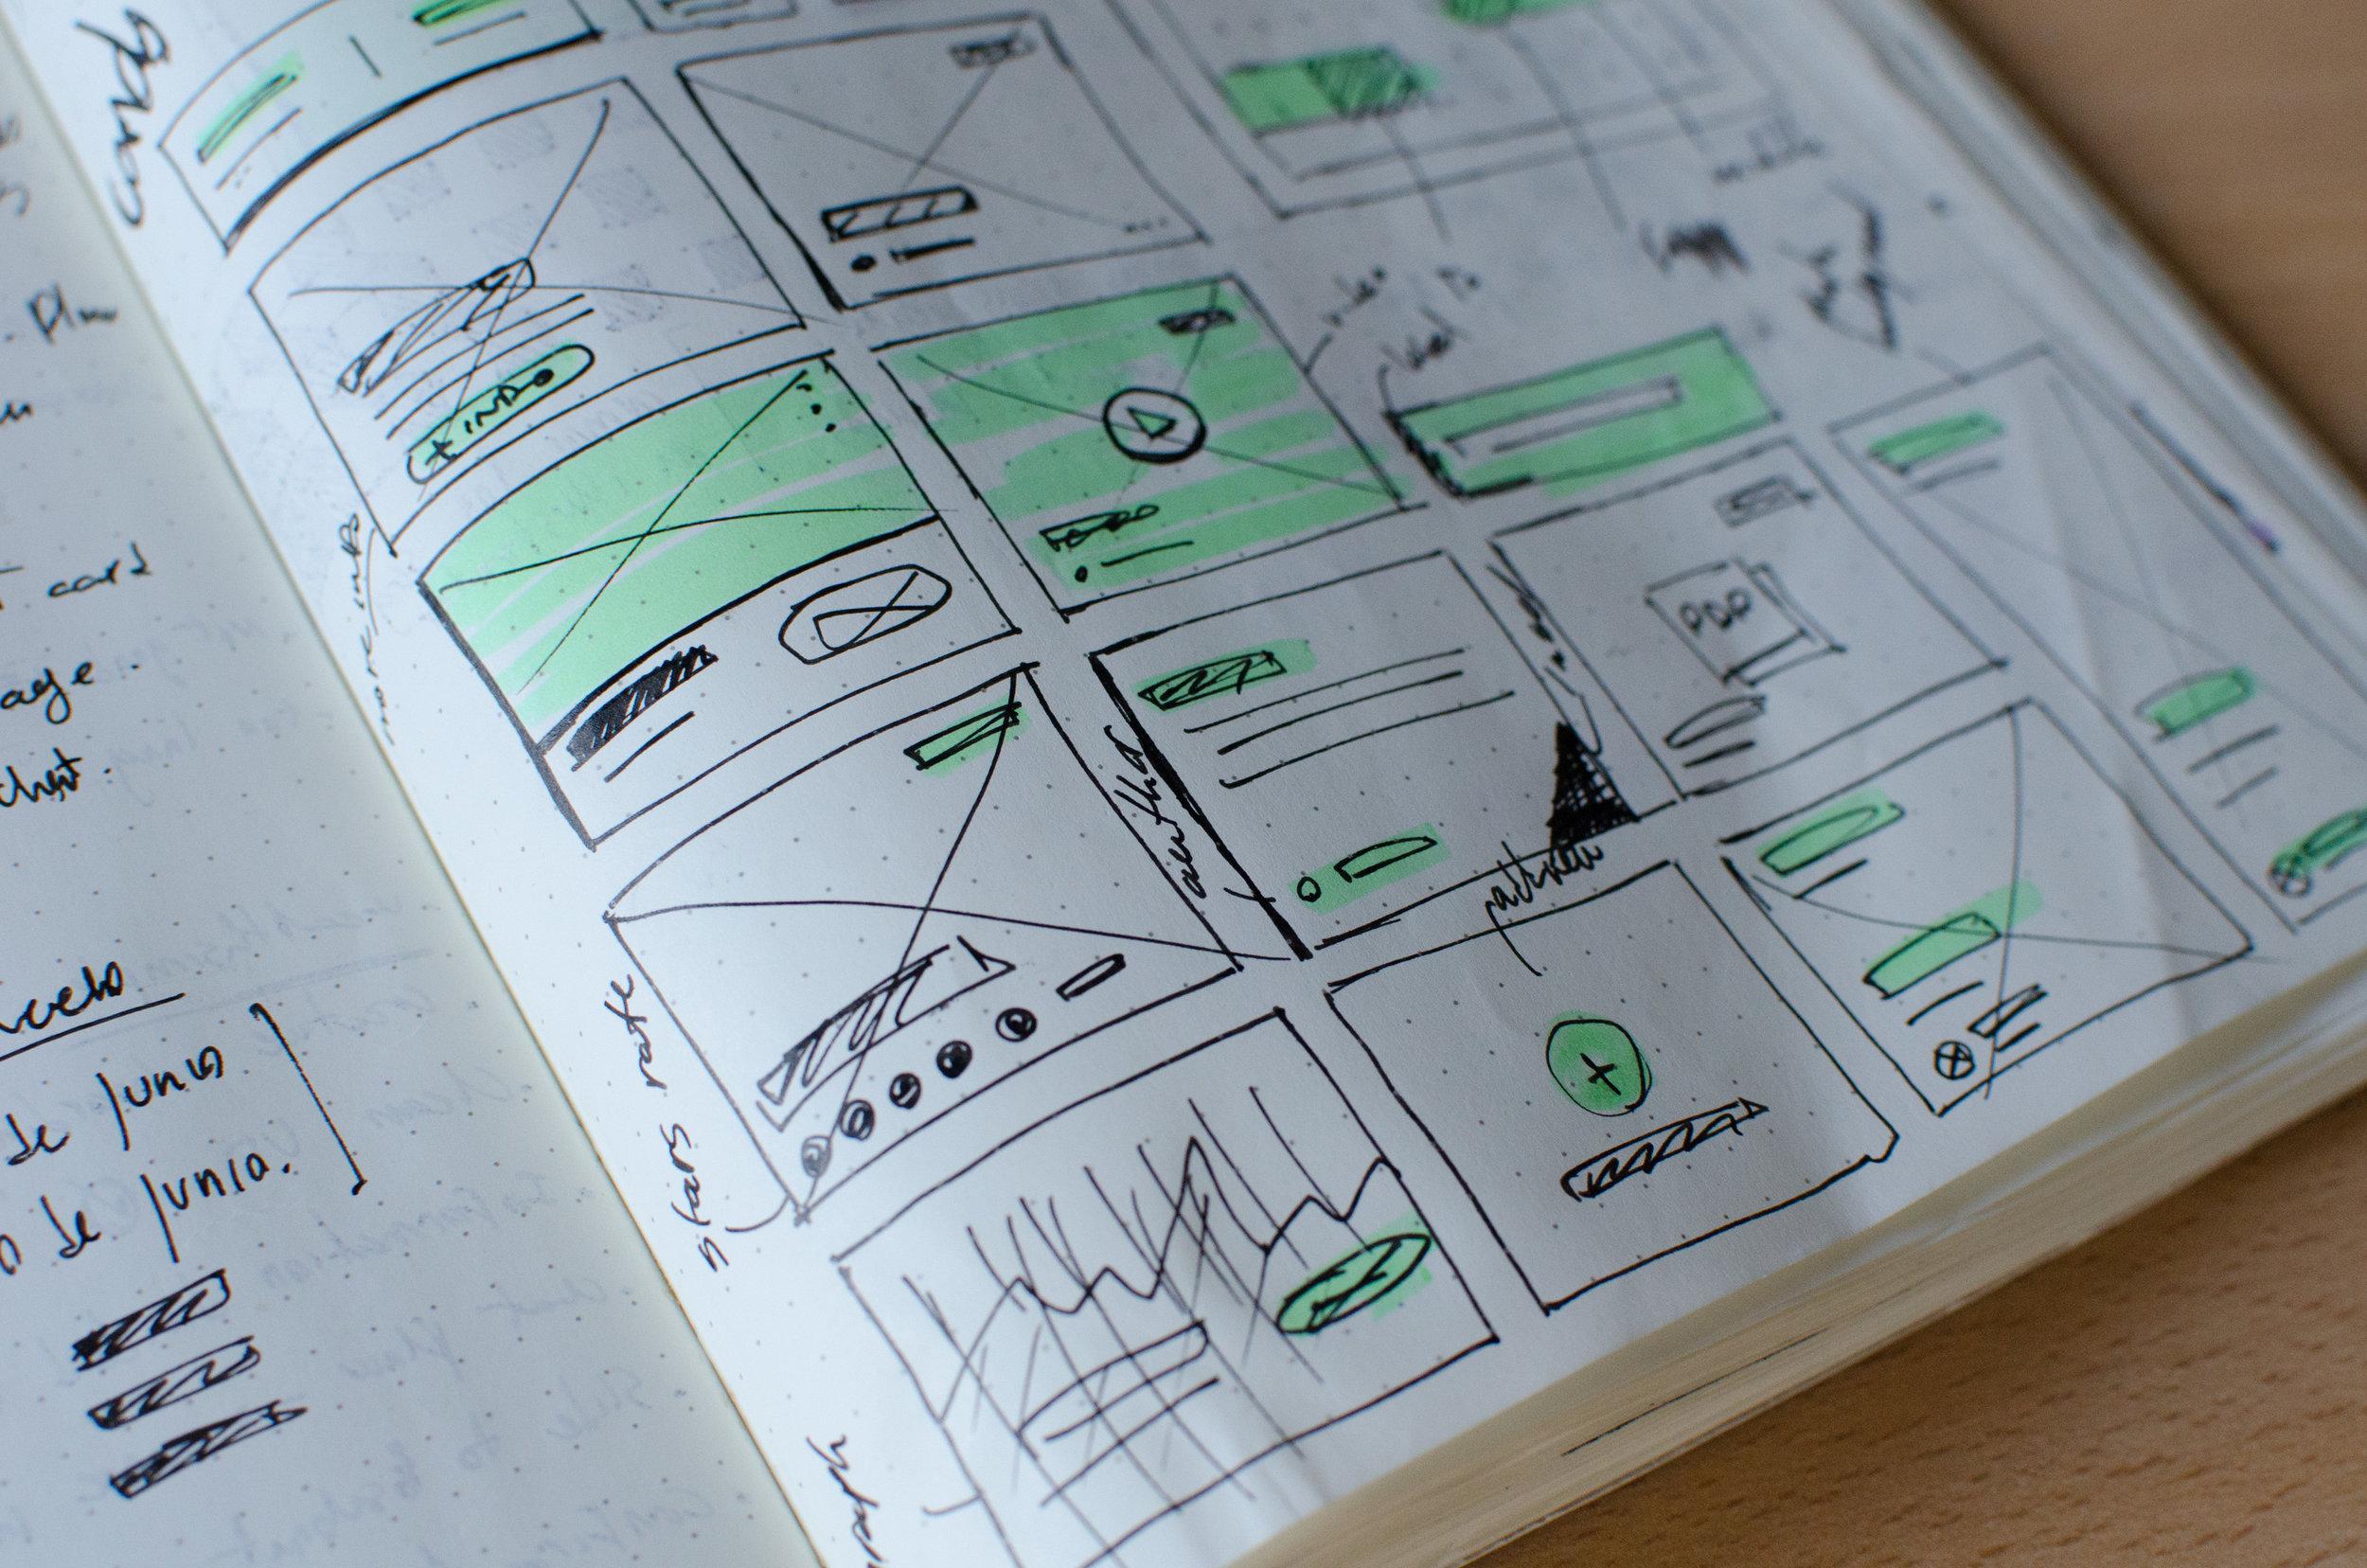 Notebook showing web development work